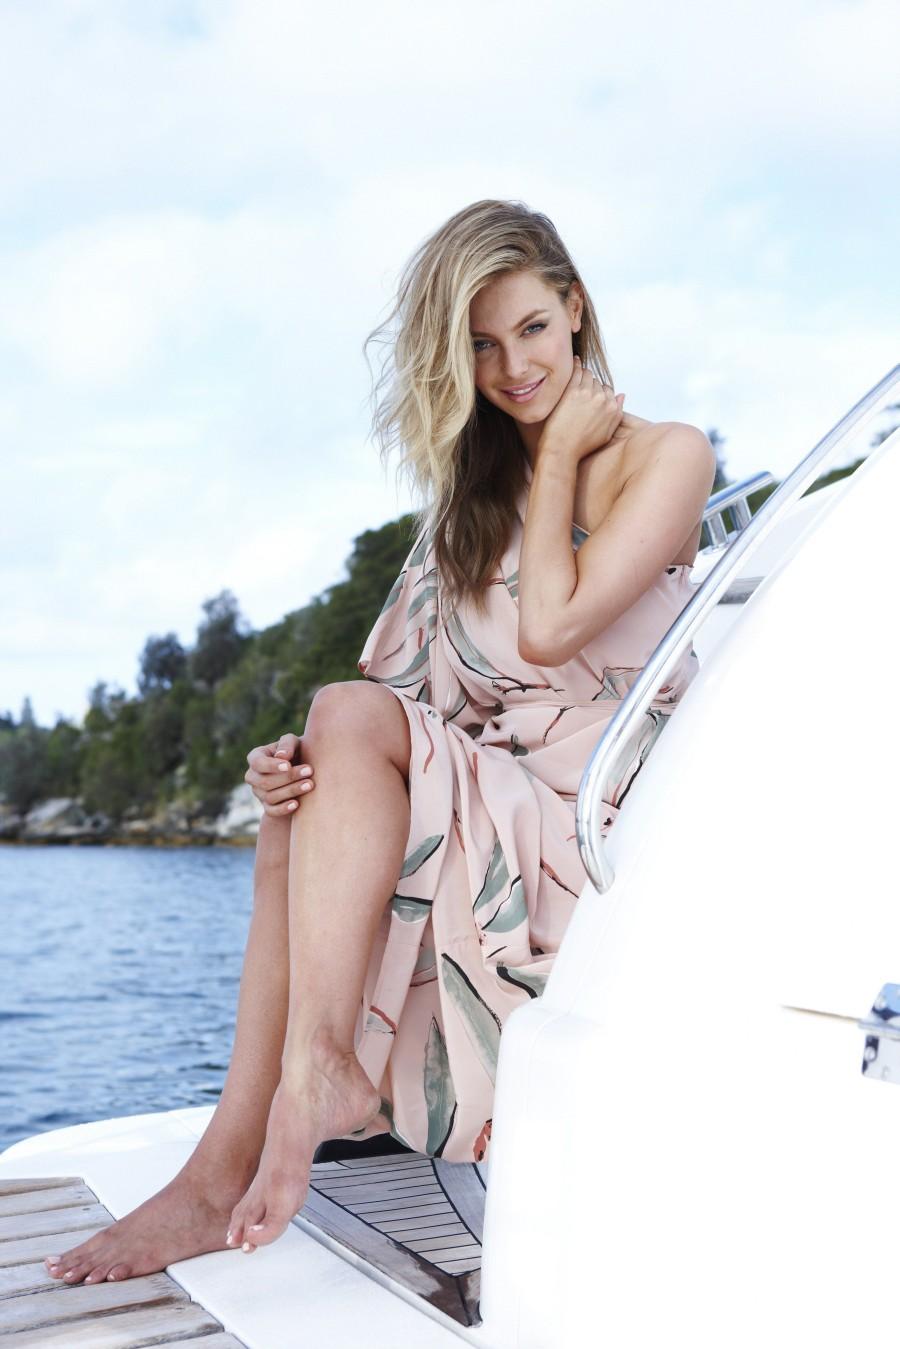 Jennifer Hawkins Photoshoot Gallery Guys Fashion Trends 2013